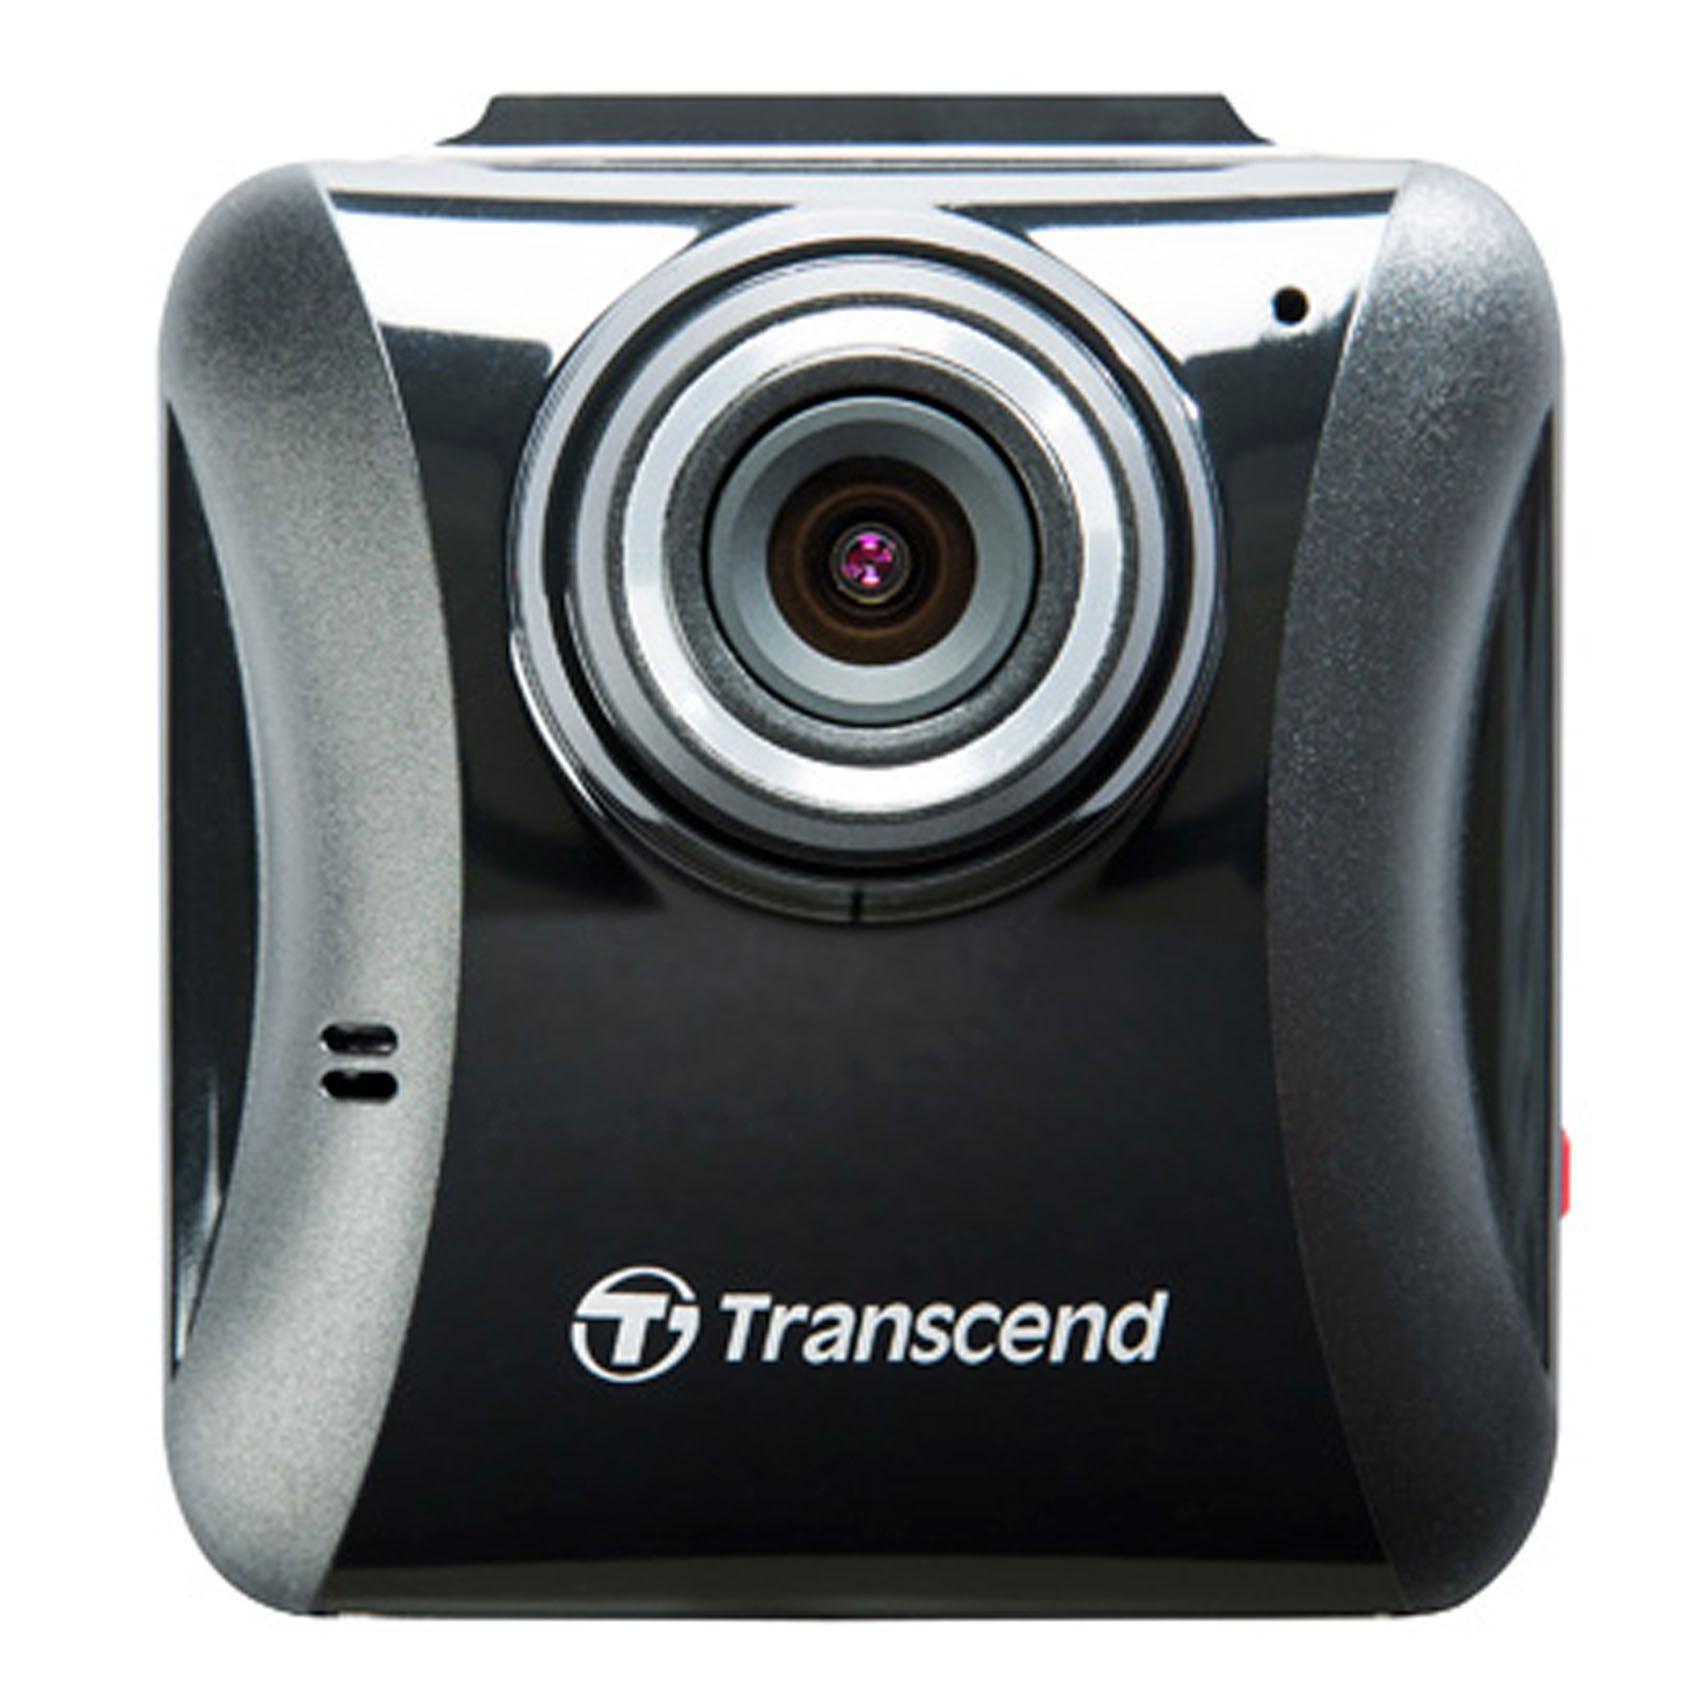 TRANSCEND CMR CAR TS16GDP100M